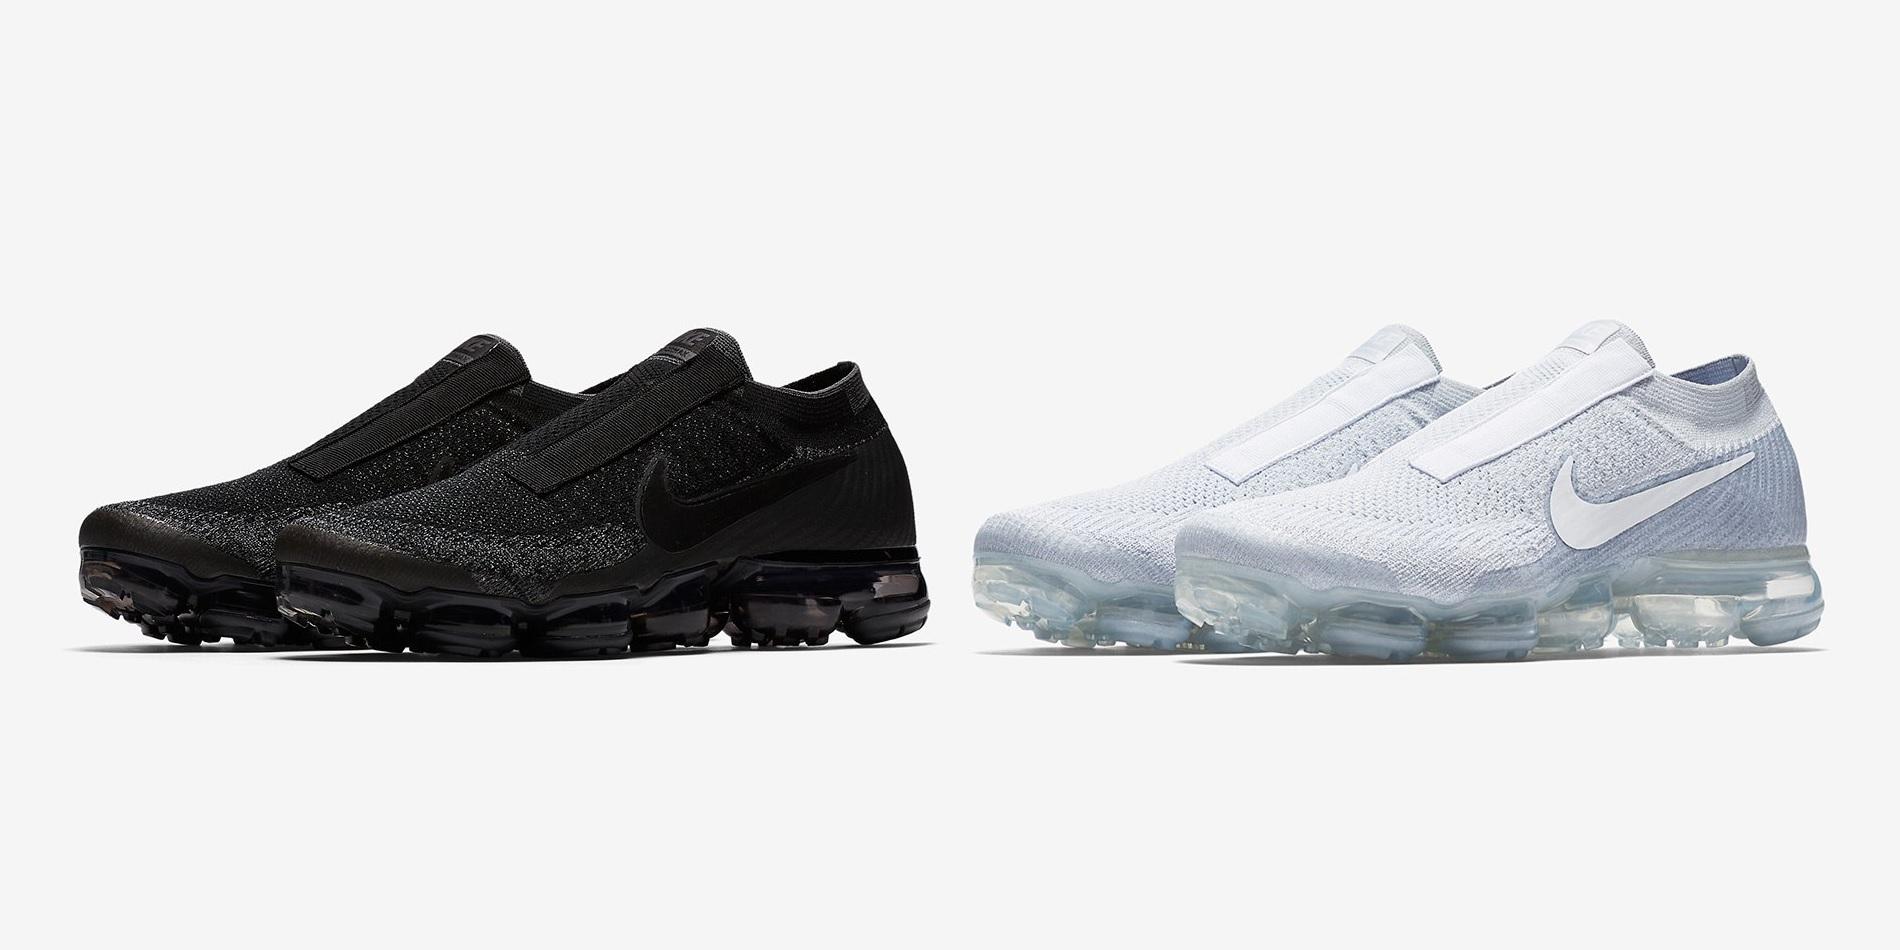 low priced b0baa 1dd26 上市速報/ Nike Air VaporMax Flyknit SE 經銷商販售資訊整理 ...